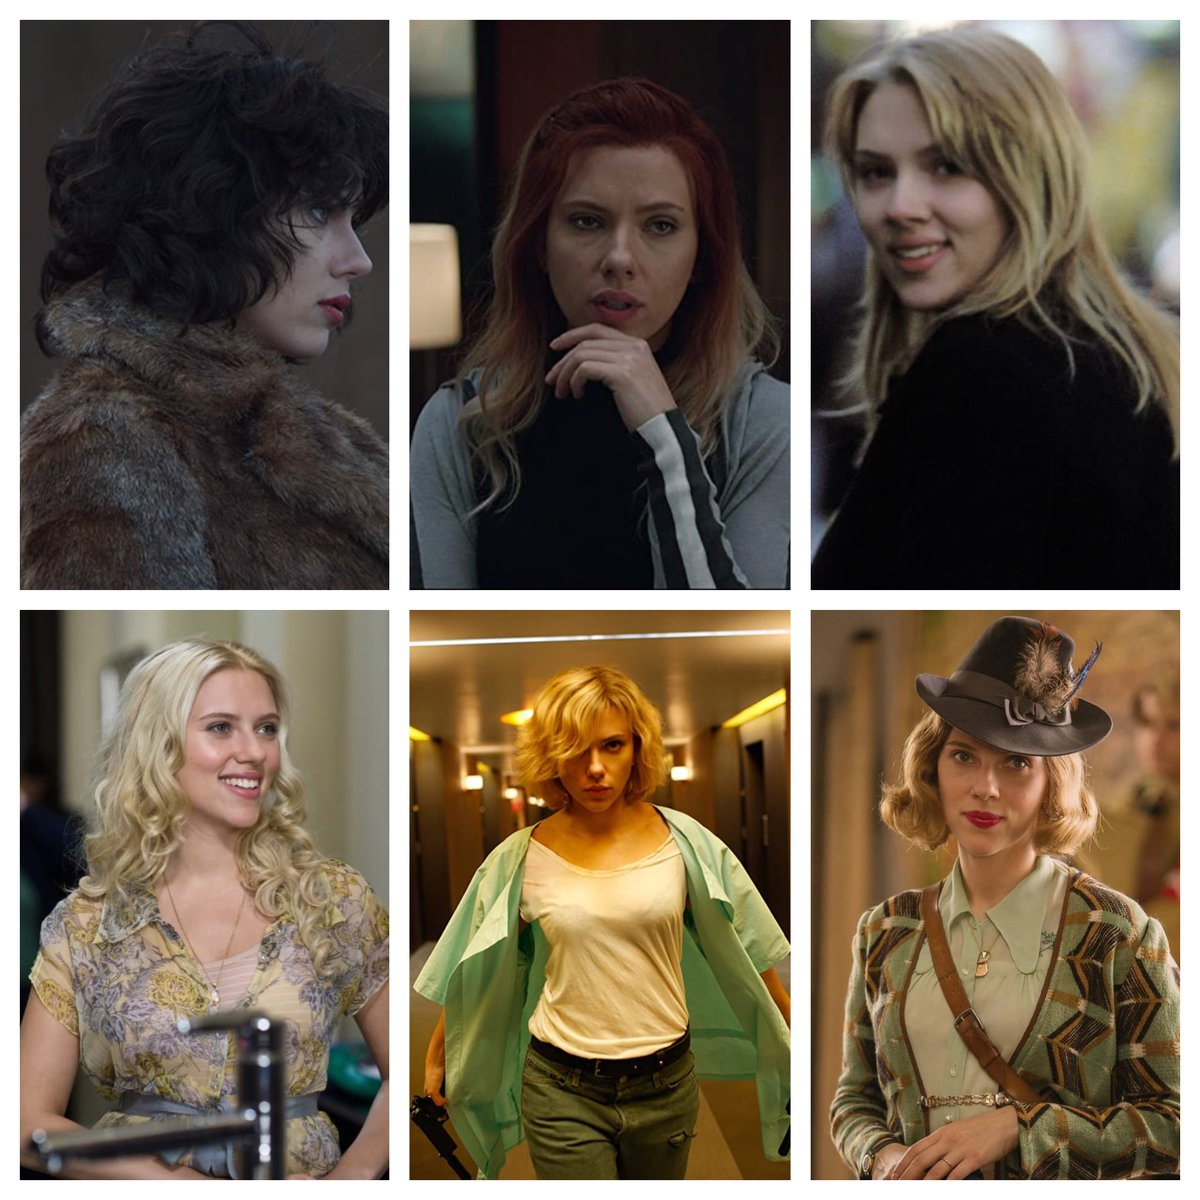 Happy 36th birthday to #ScarlettJohansson! 🥳 Which of her 69 acting credits is your favorite?? #AllenTheatres #UnderTheSkin #AvengersEndgame #LostInTranslation #HesJustNotThatIntoYou #Lucy #JojoRabbbit